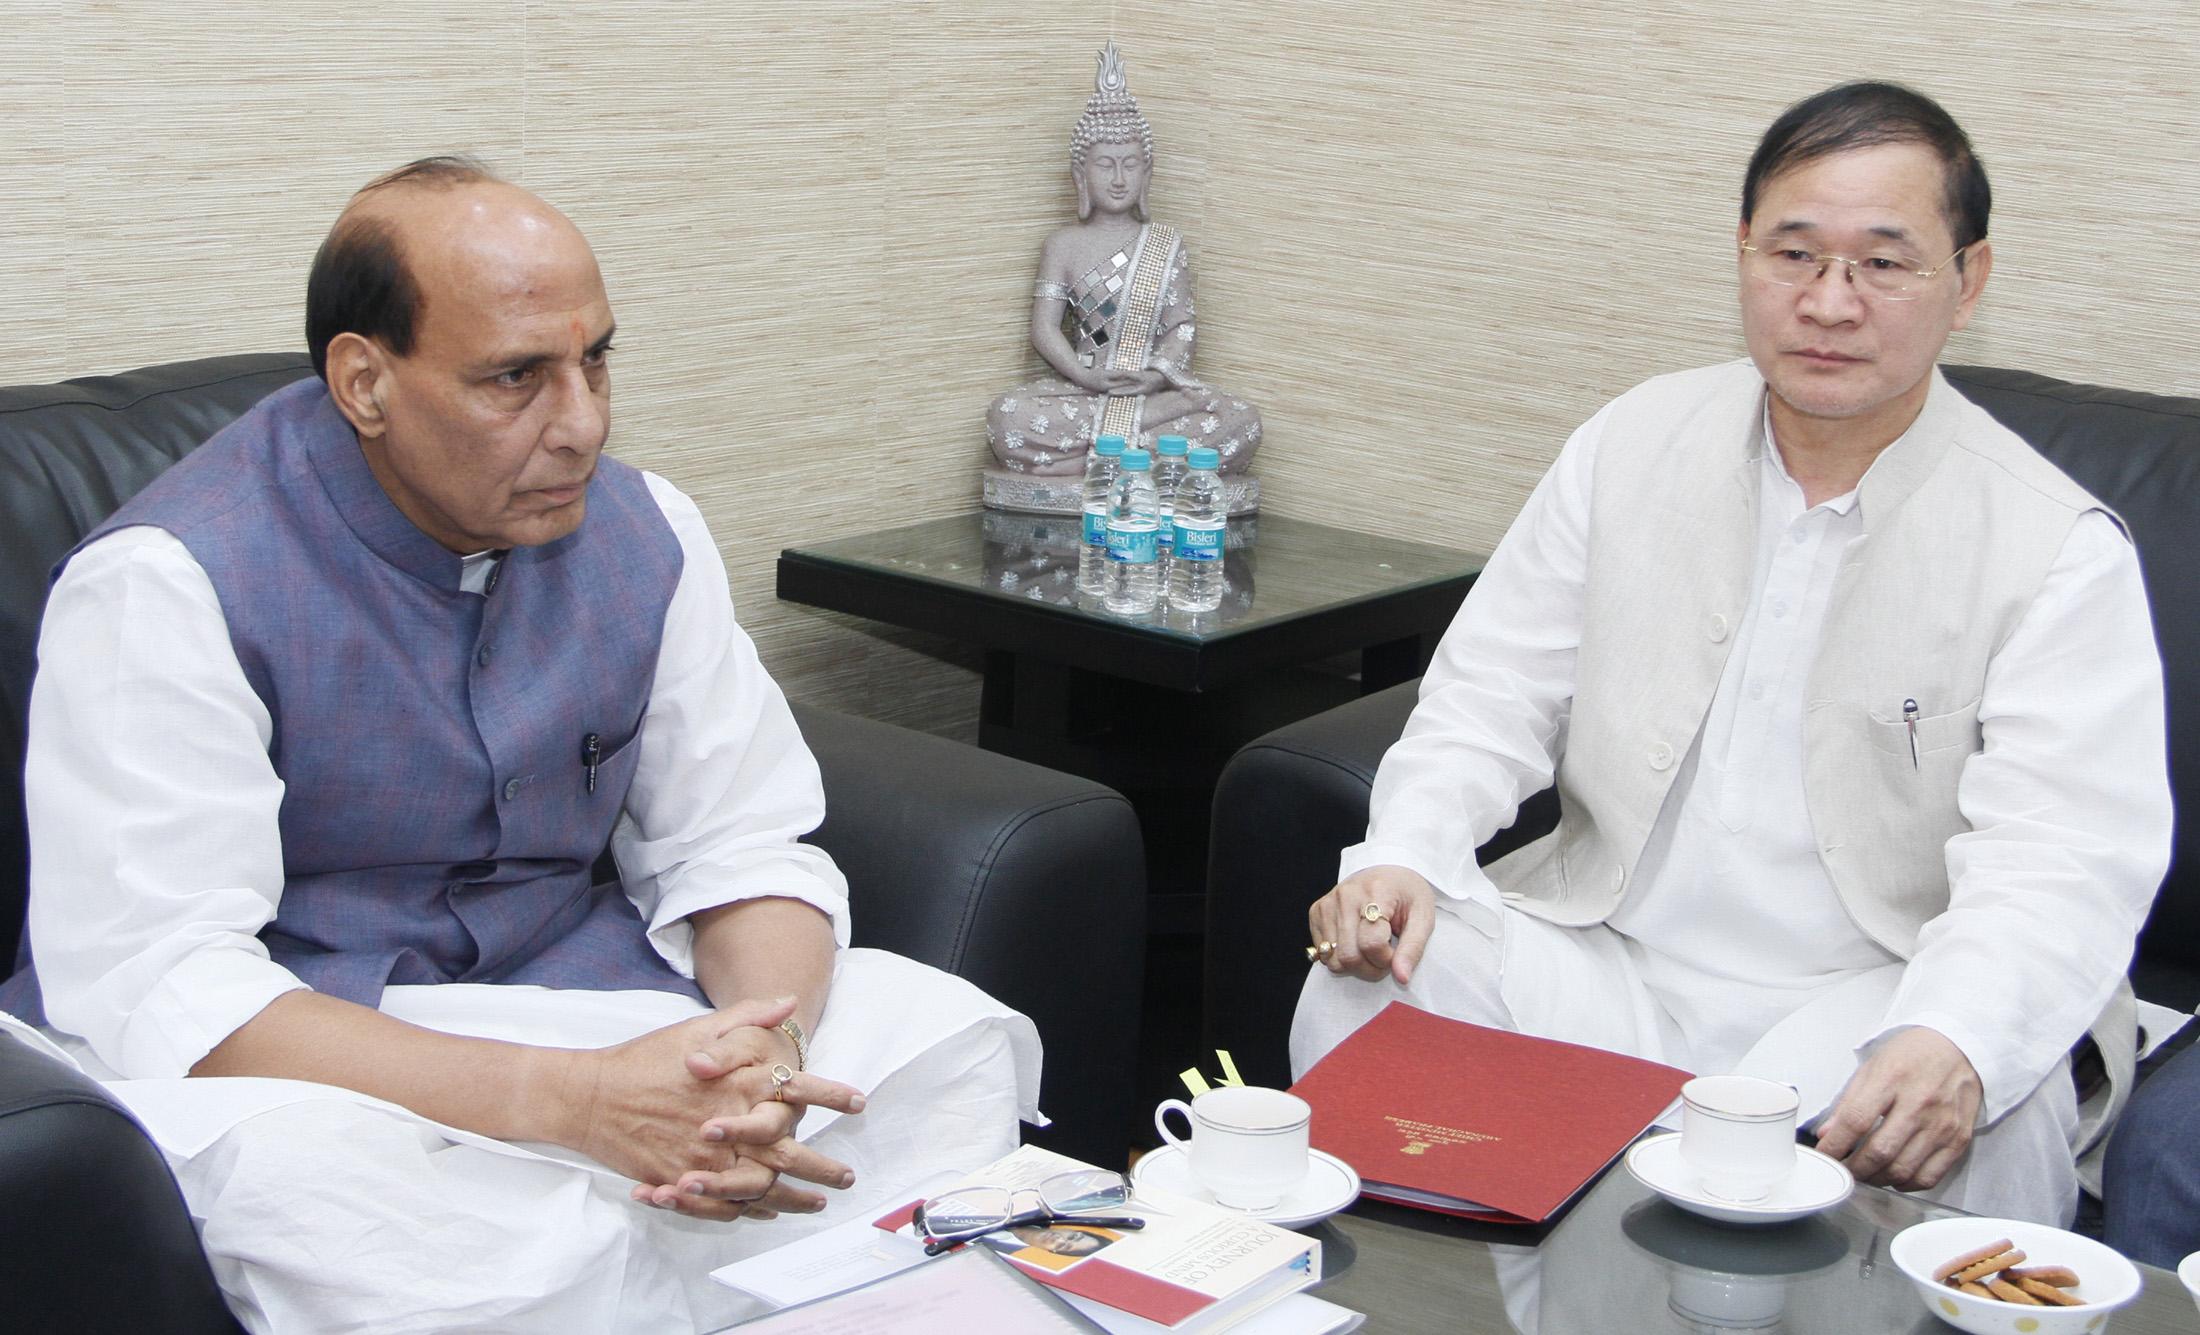 The Chief Minister of Arunachal Pradesh, Shri Nabam Tuki calling on the Union Home Minister, Shri Rajnath Singh, in New Delhi on September 06, 2015.